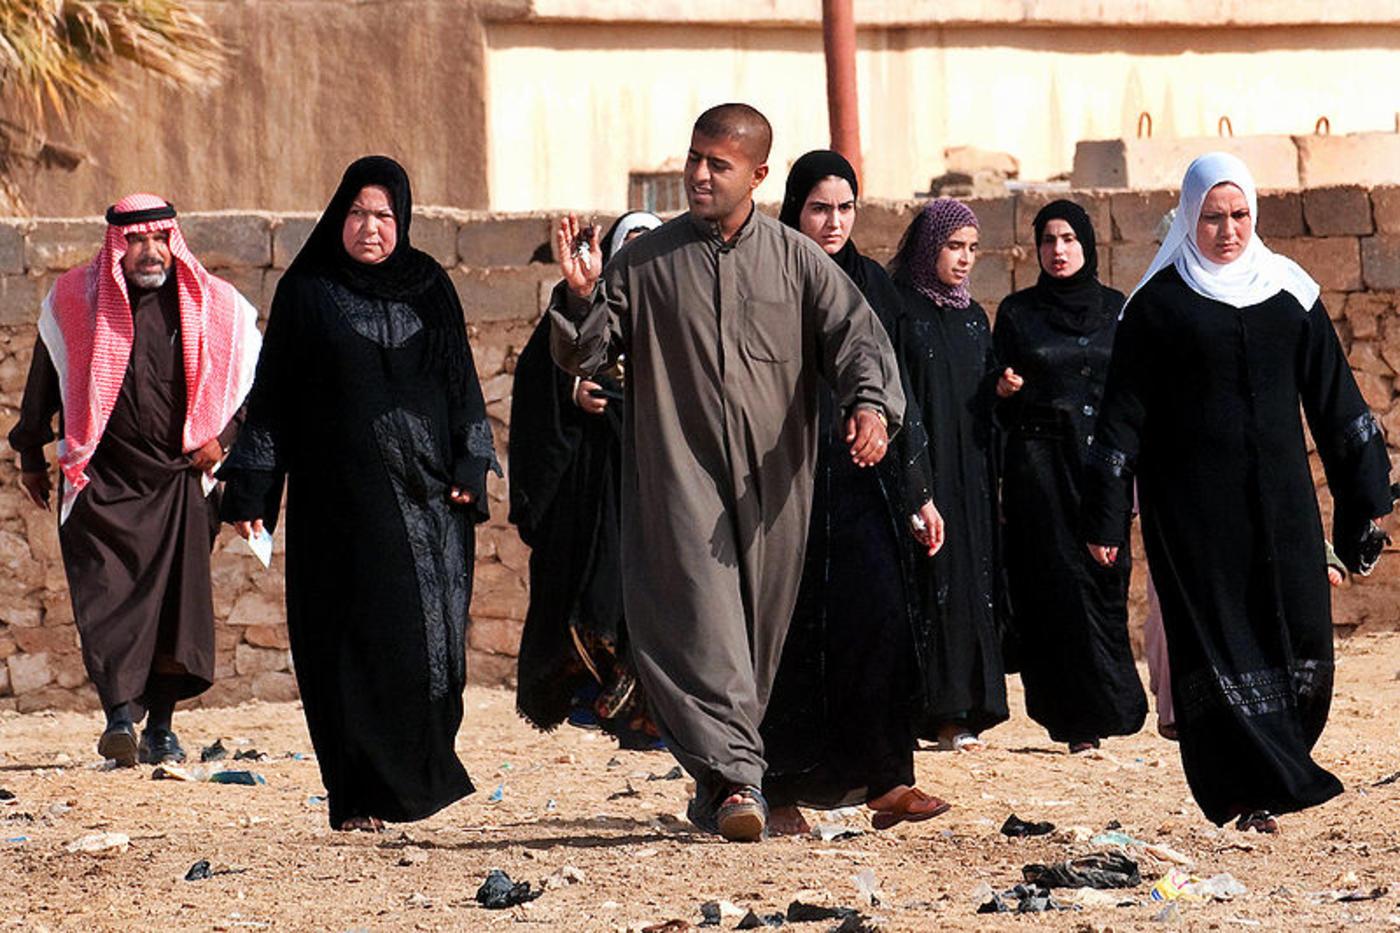 2010 Iraqi parliamentary election